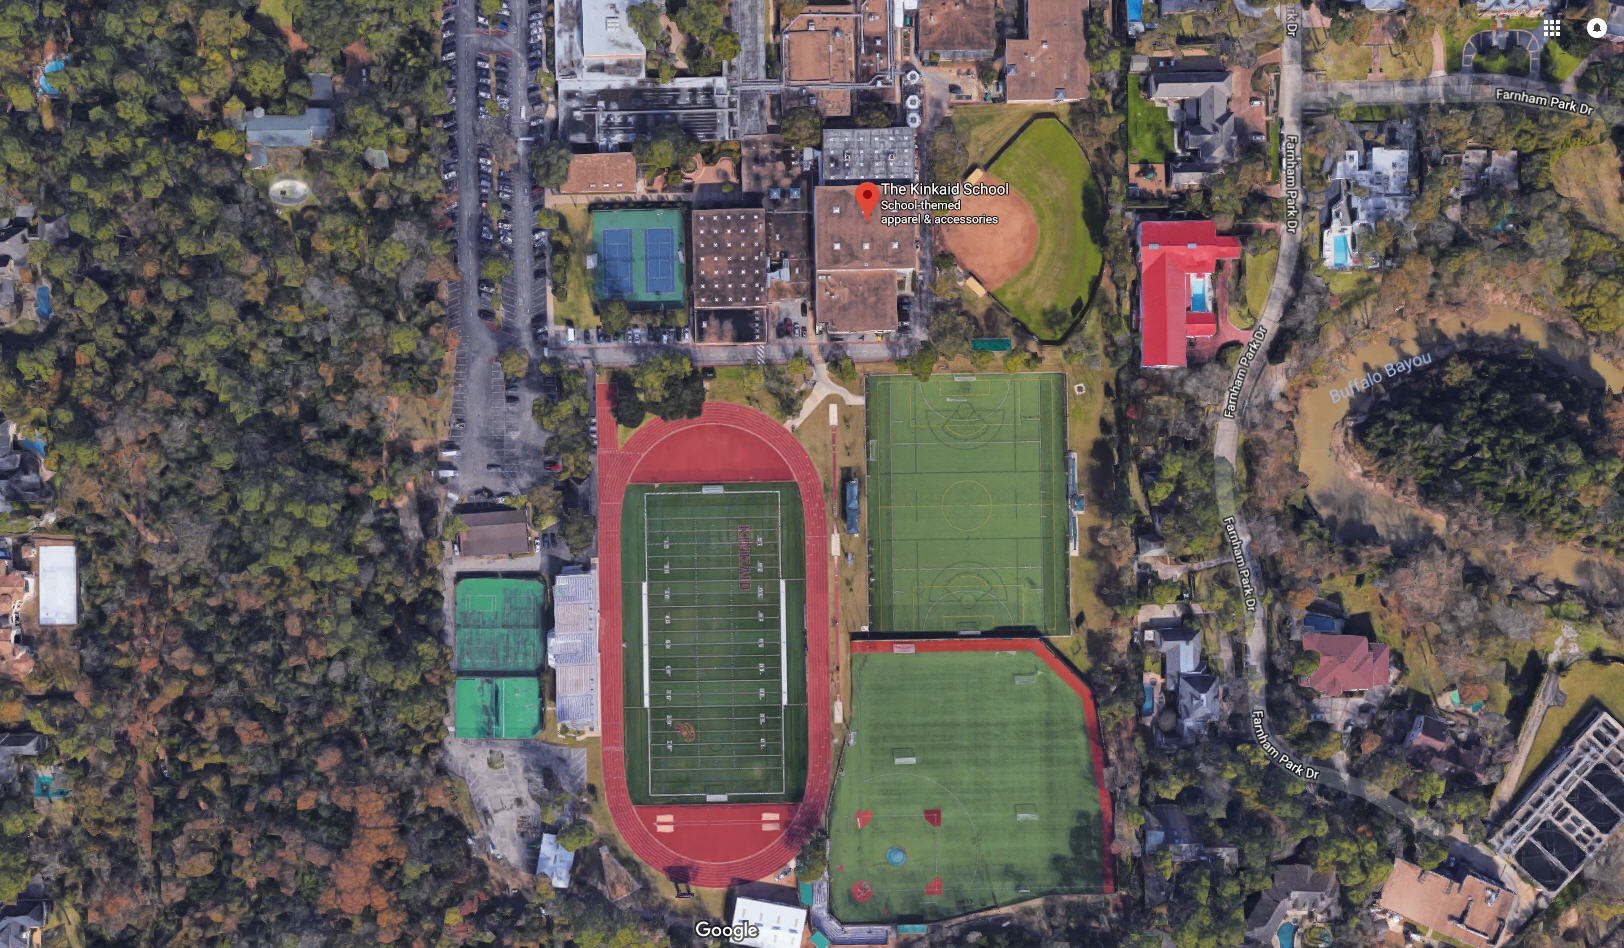 Houston S Kinkaid School Investigation Finds Three